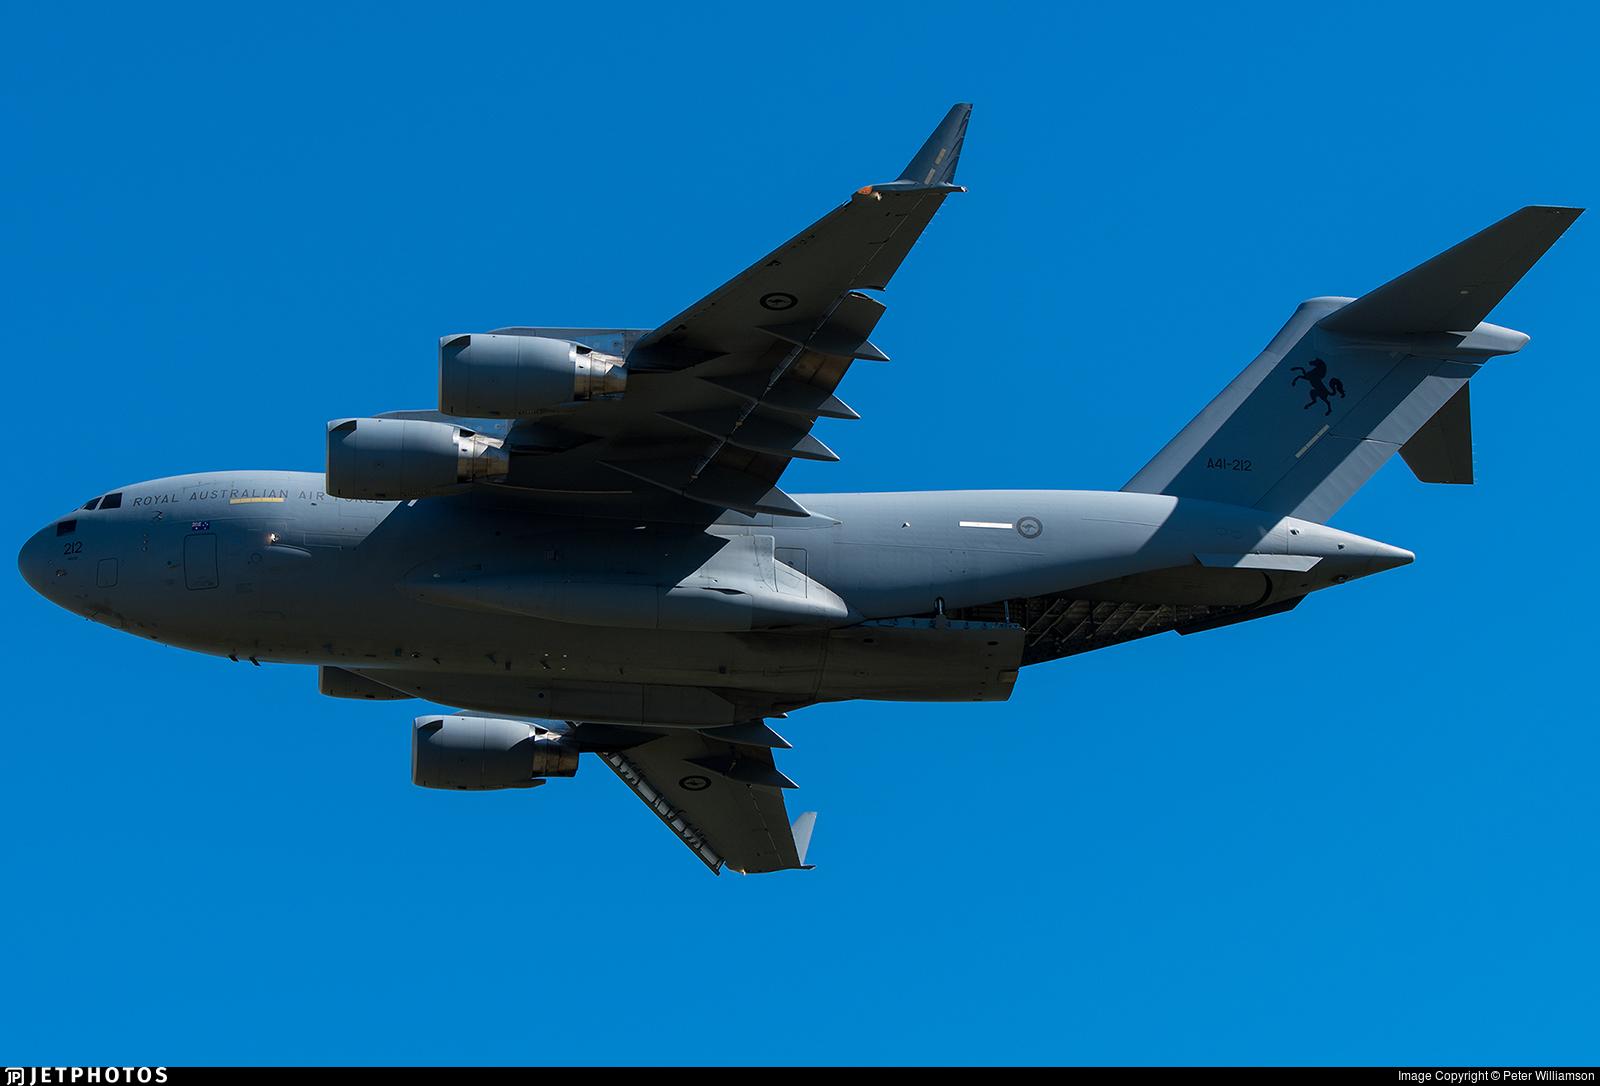 A41-212 - Boeing C-17A Globemaster III - Australia - Royal Australian Air Force (RAAF)